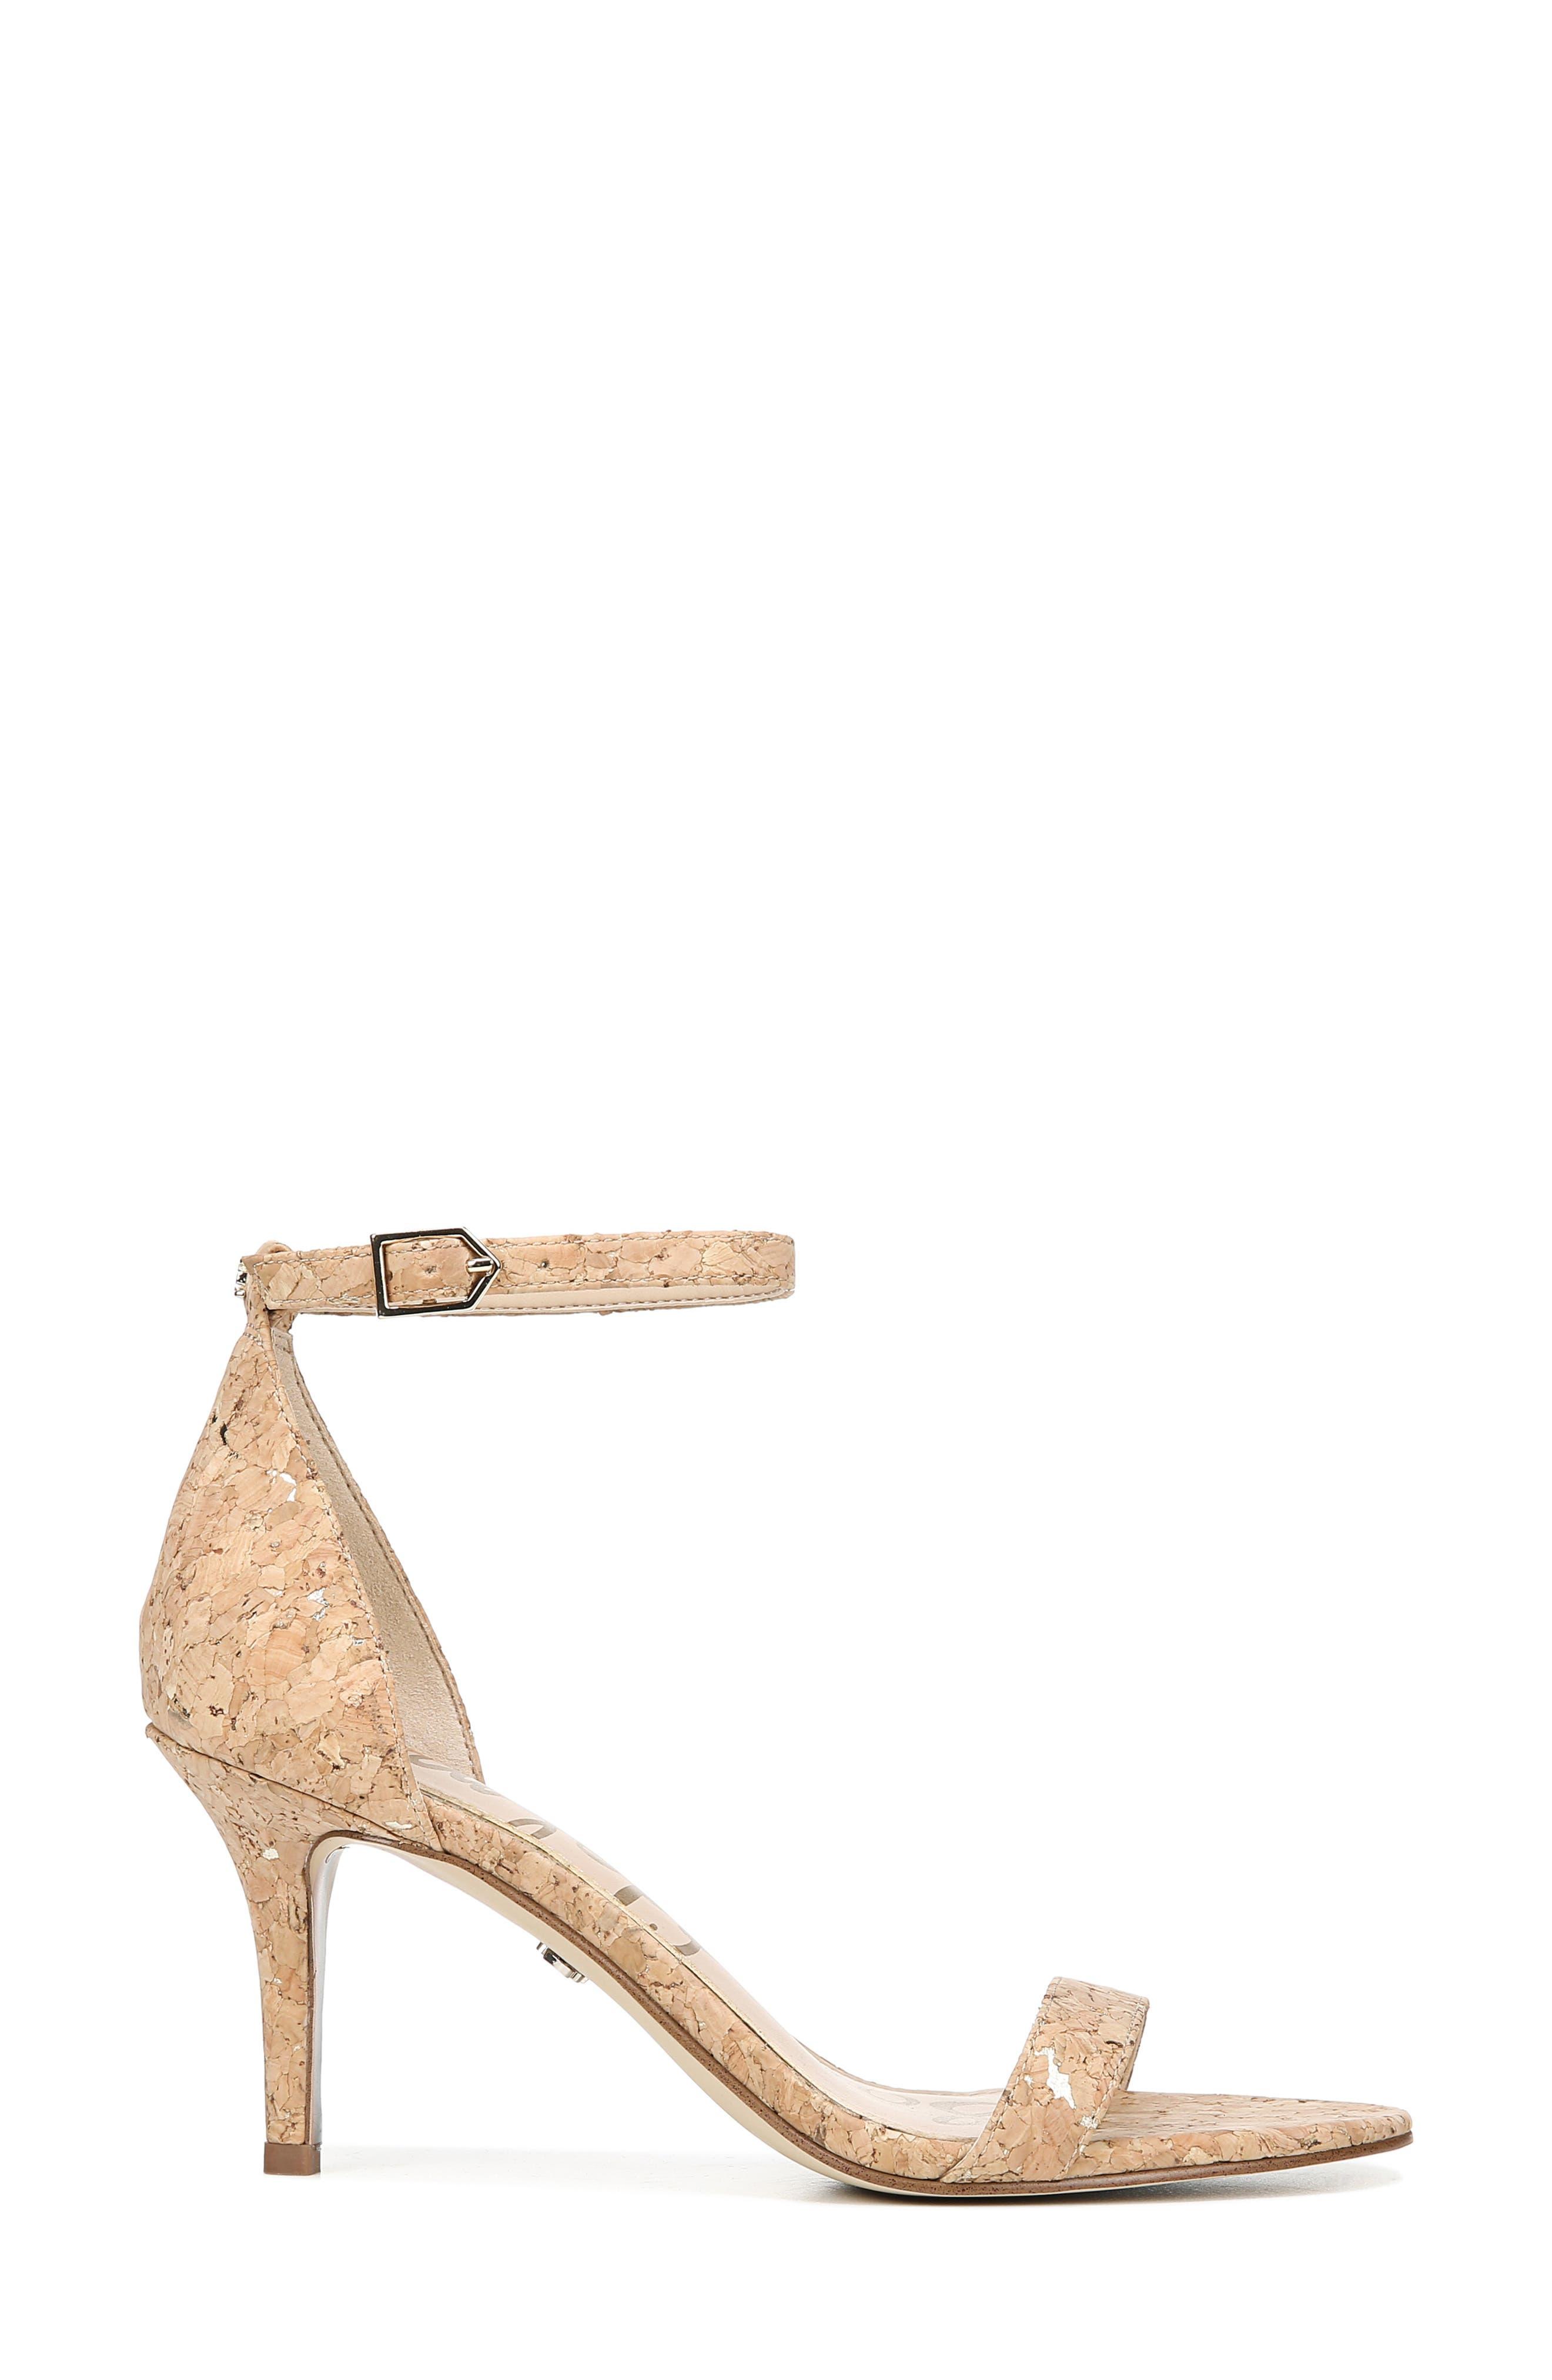 ,                             'Patti' Ankle Strap Sandal,                             Alternate thumbnail 81, color,                             251